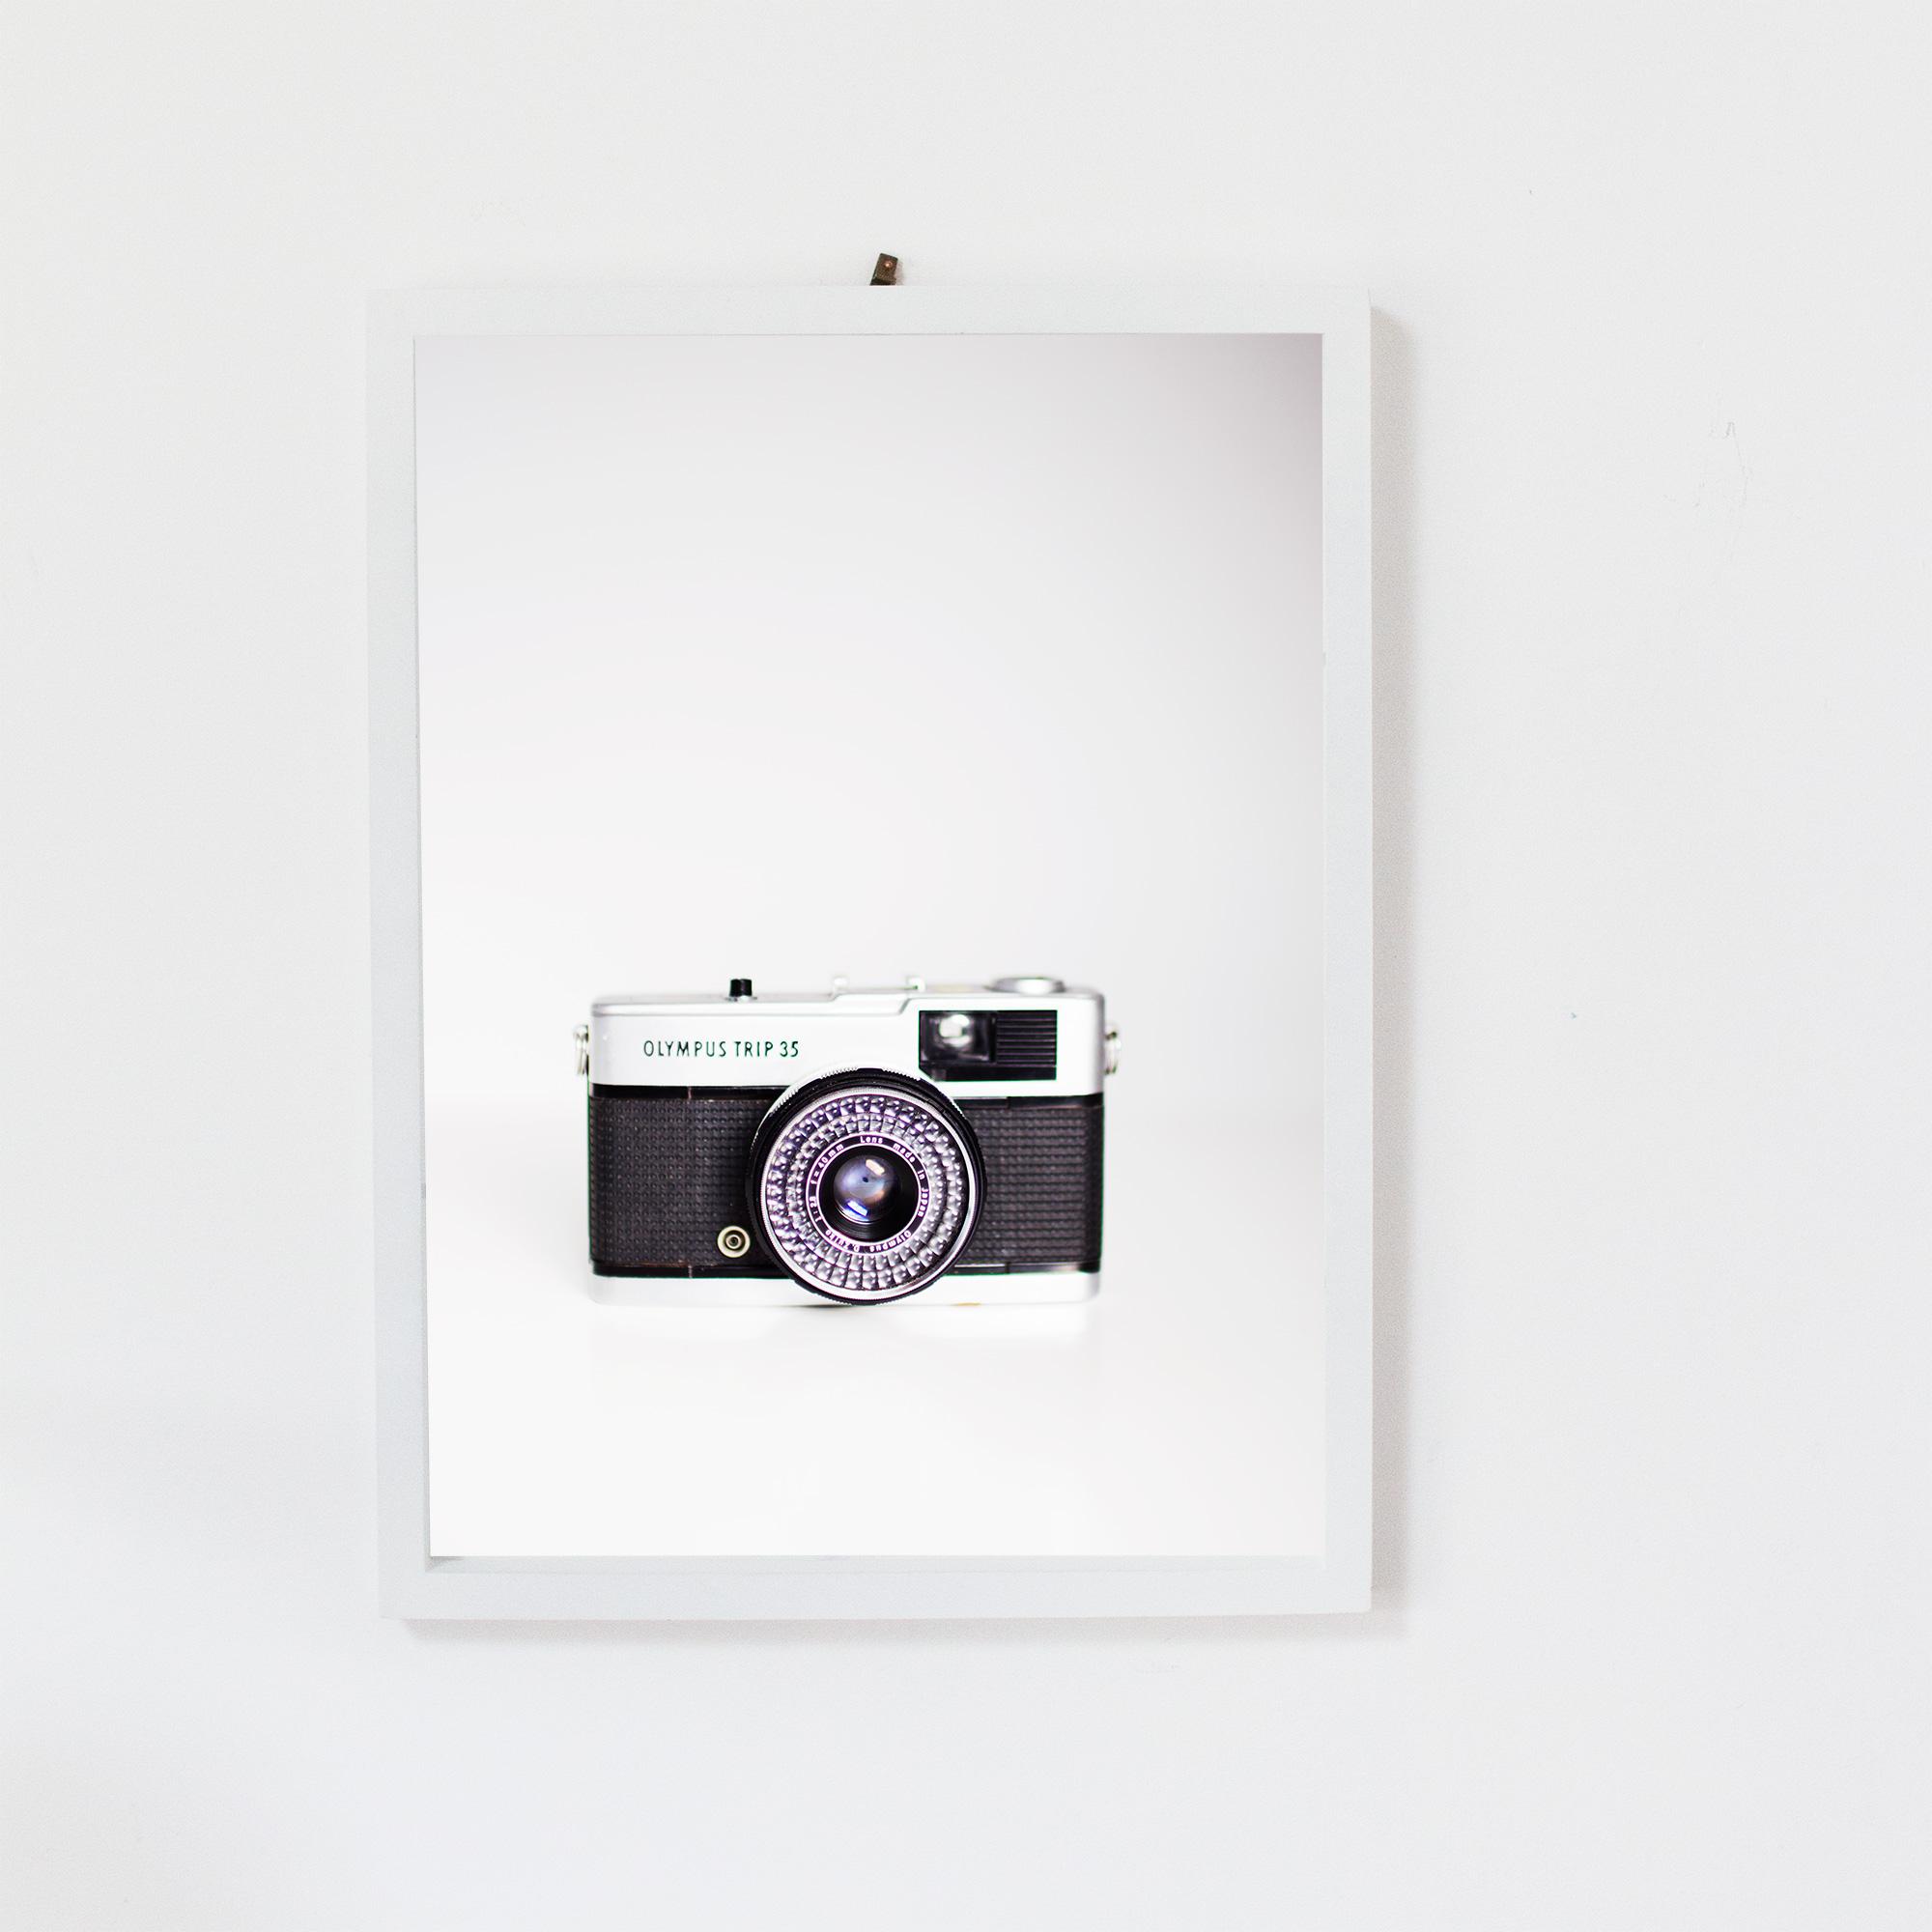 etsy-olympus-print.jpg